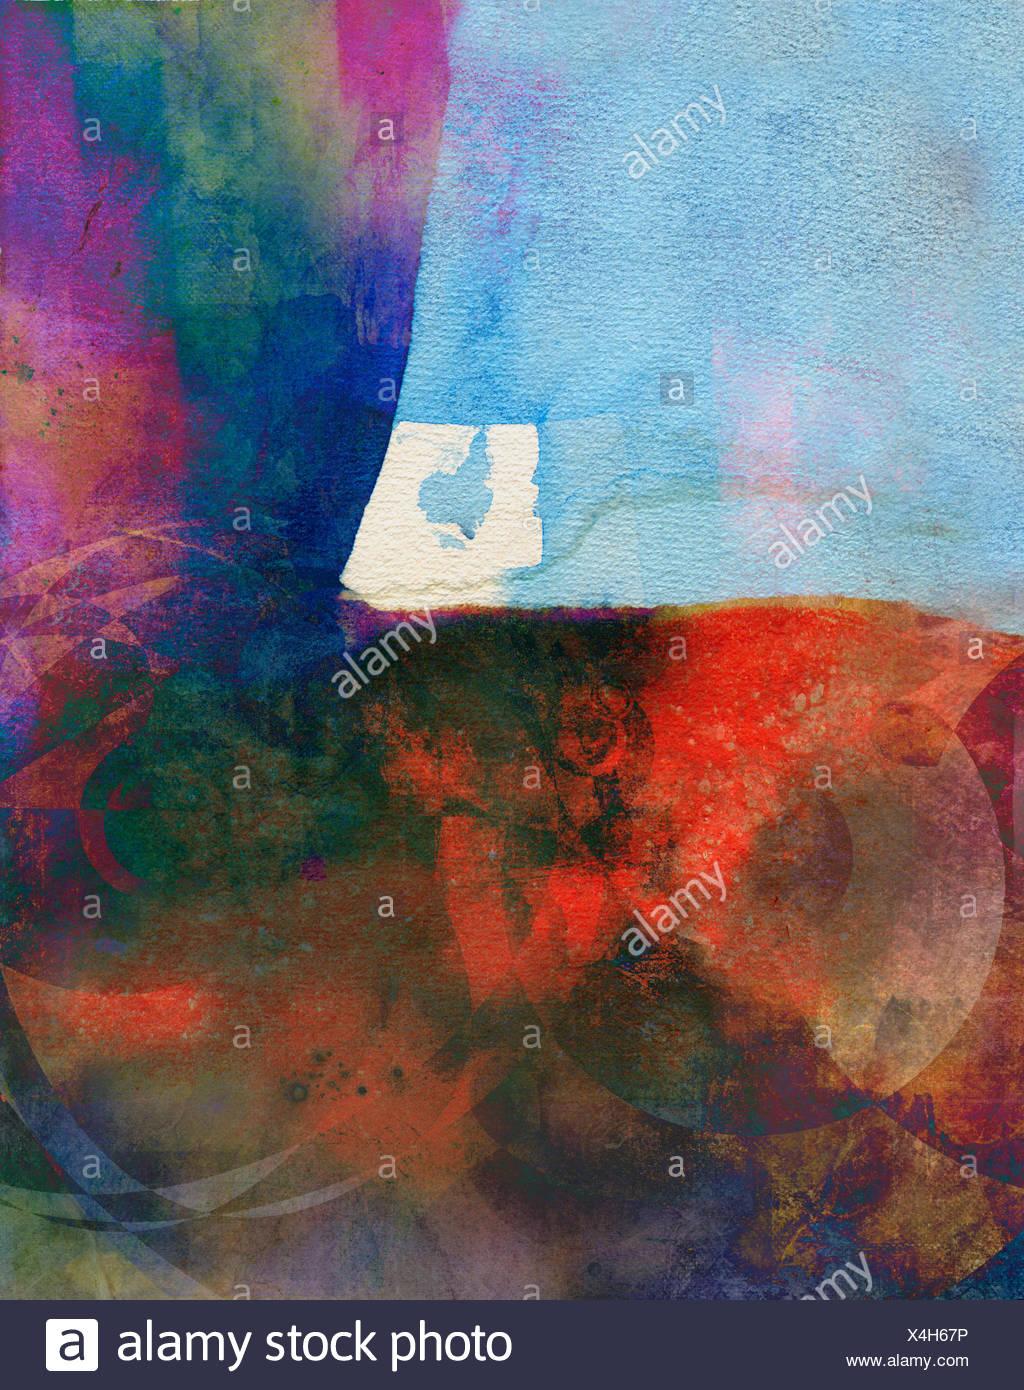 aquarell abstrakt muster bunt - Stock Image